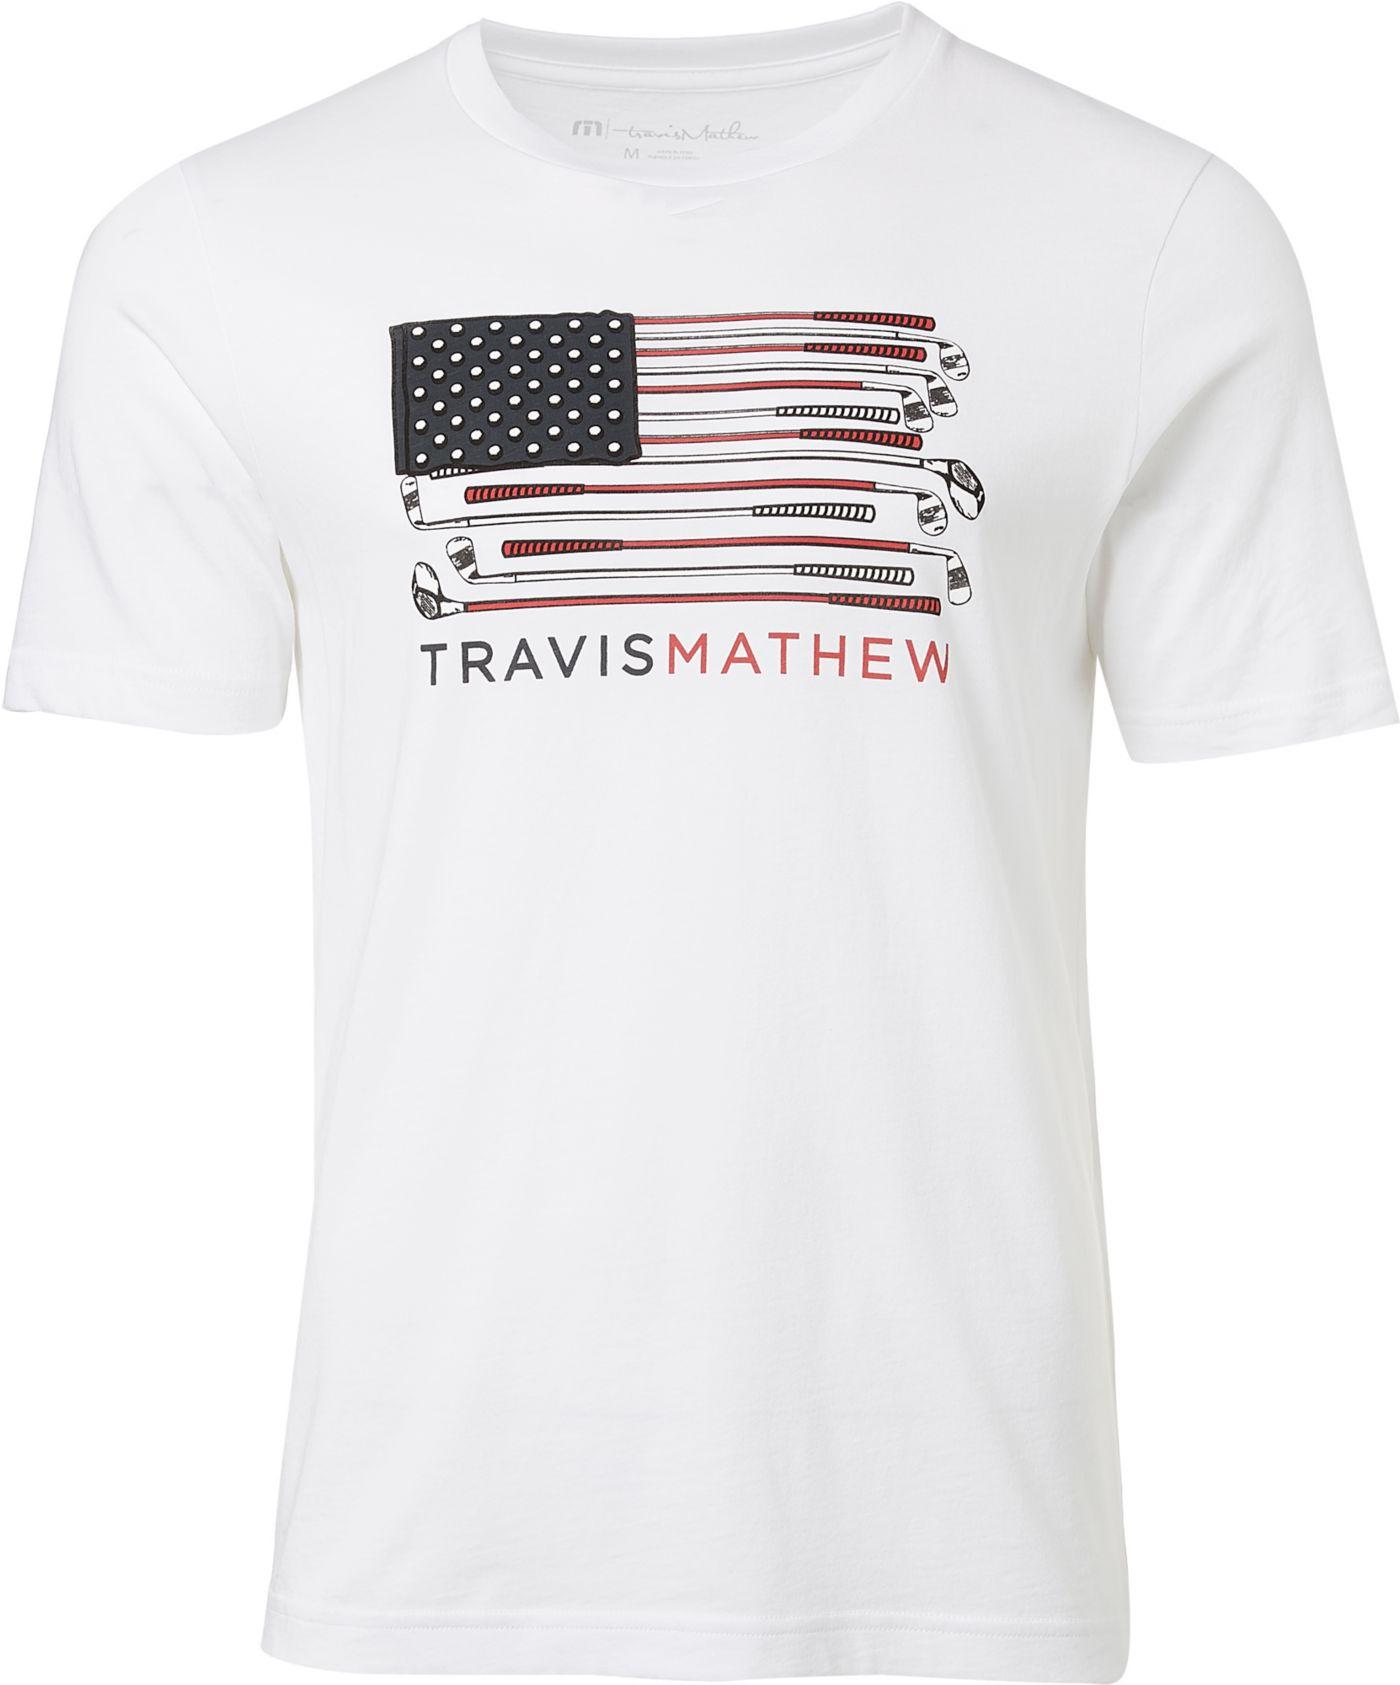 TravisMathew Men's The Stashe Golf T-Shirt